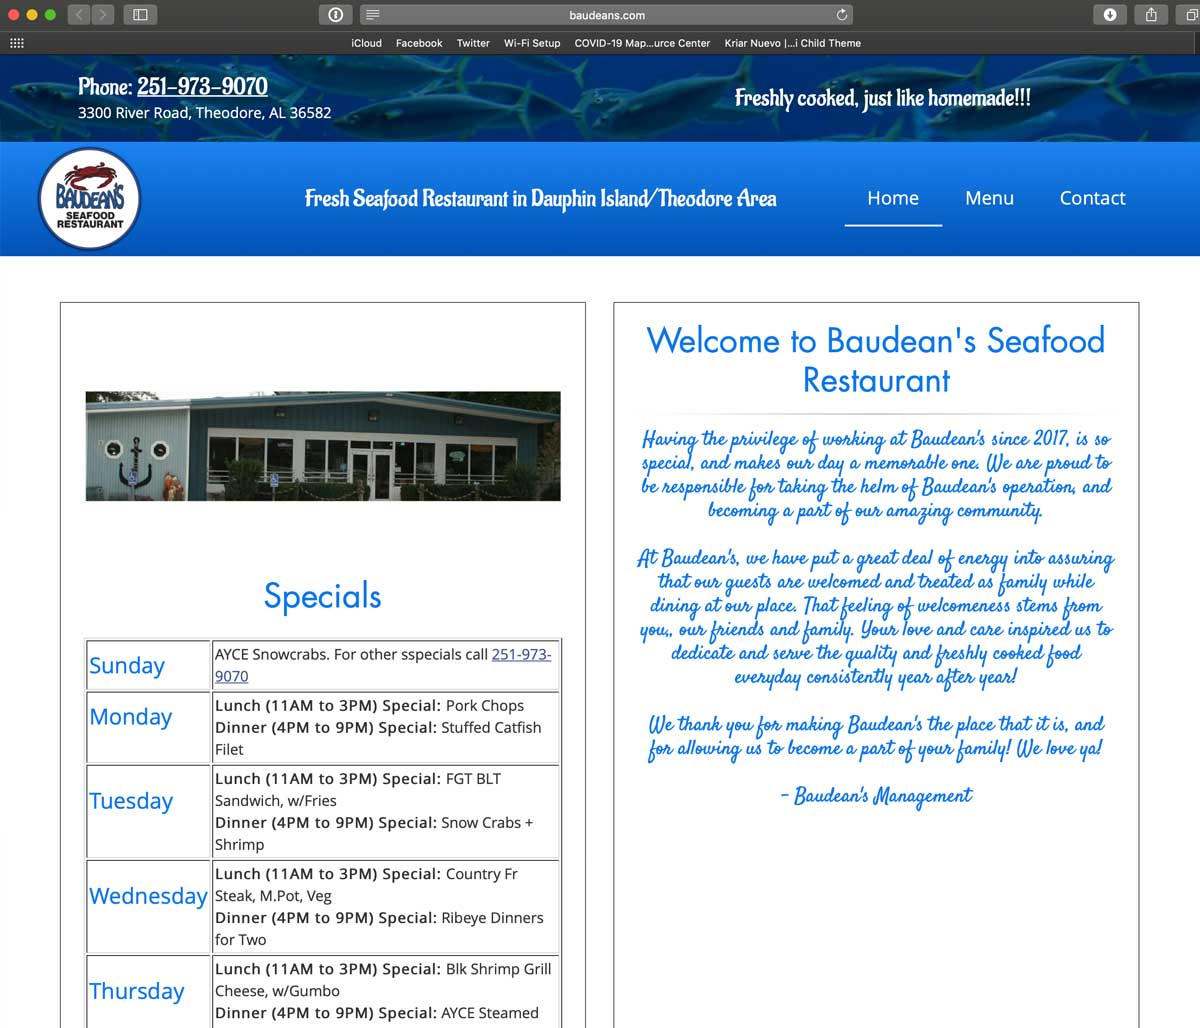 Baudean's Seafood Restaurant